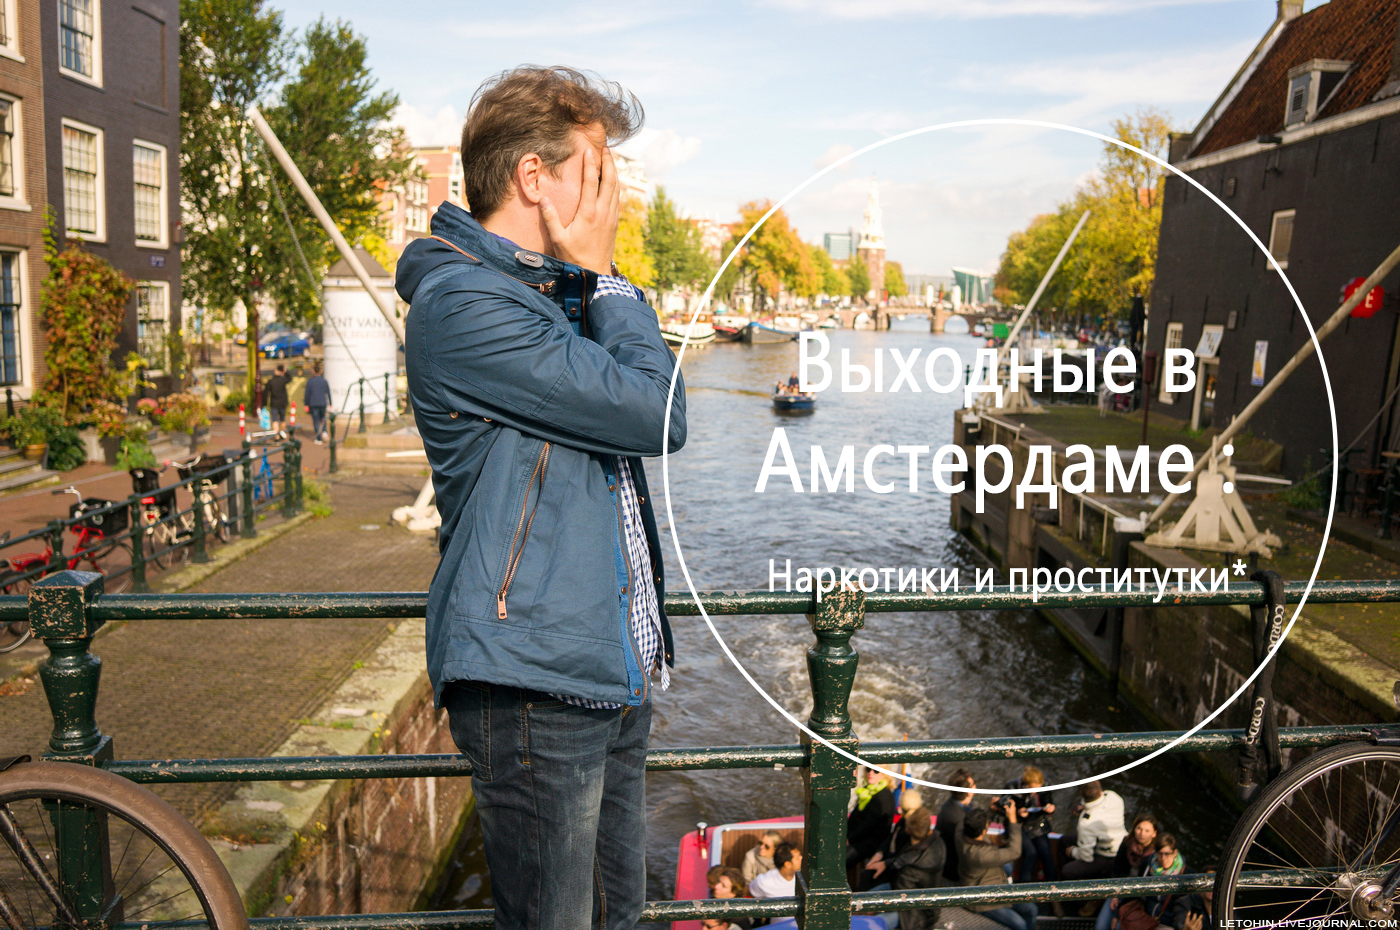 Шлюхи славянский бульвар 1800 рублей